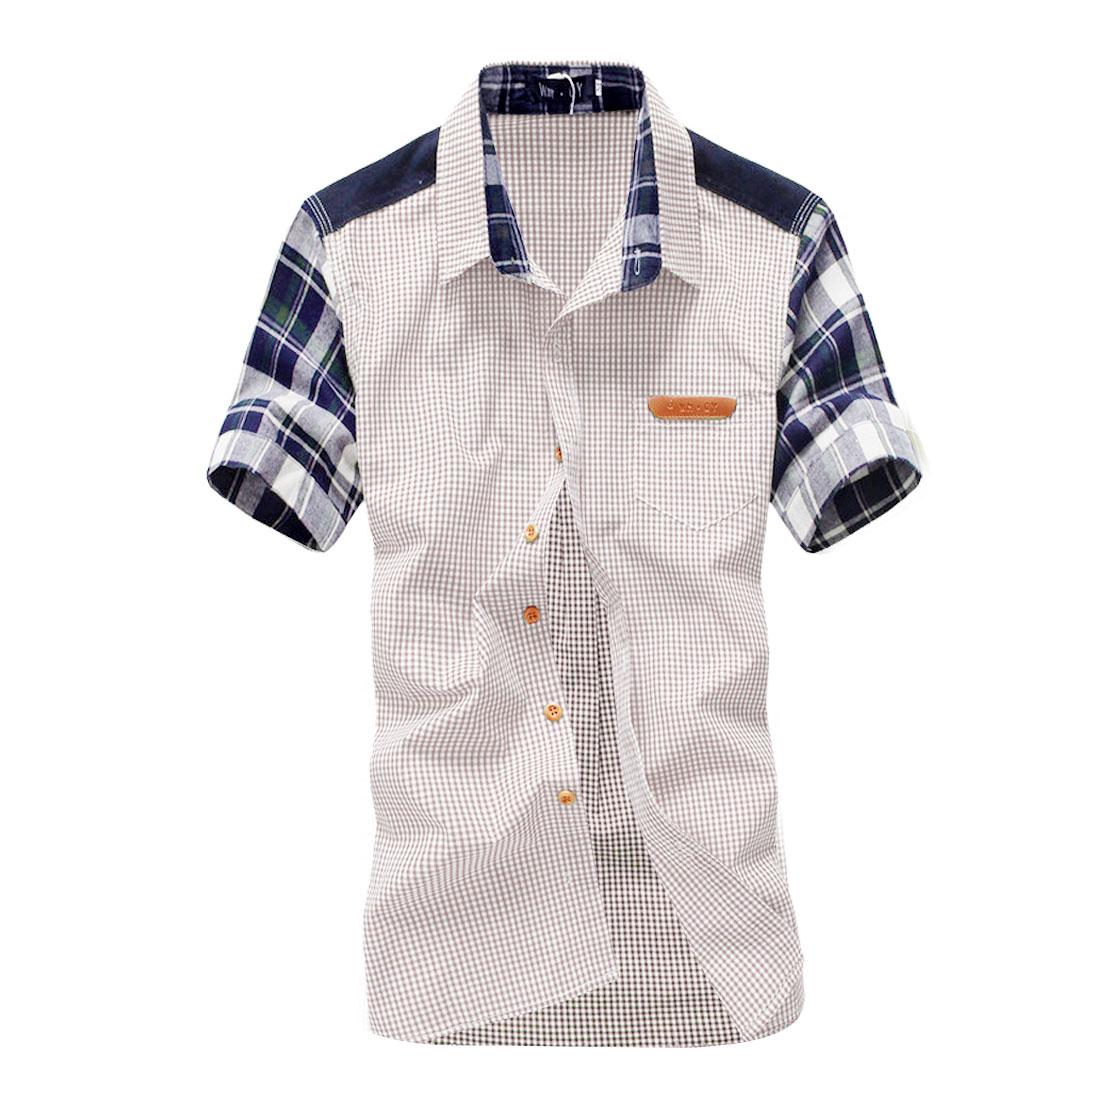 Mens Light Khaki Short Sleeves Panel Leisure Summer Shirt M